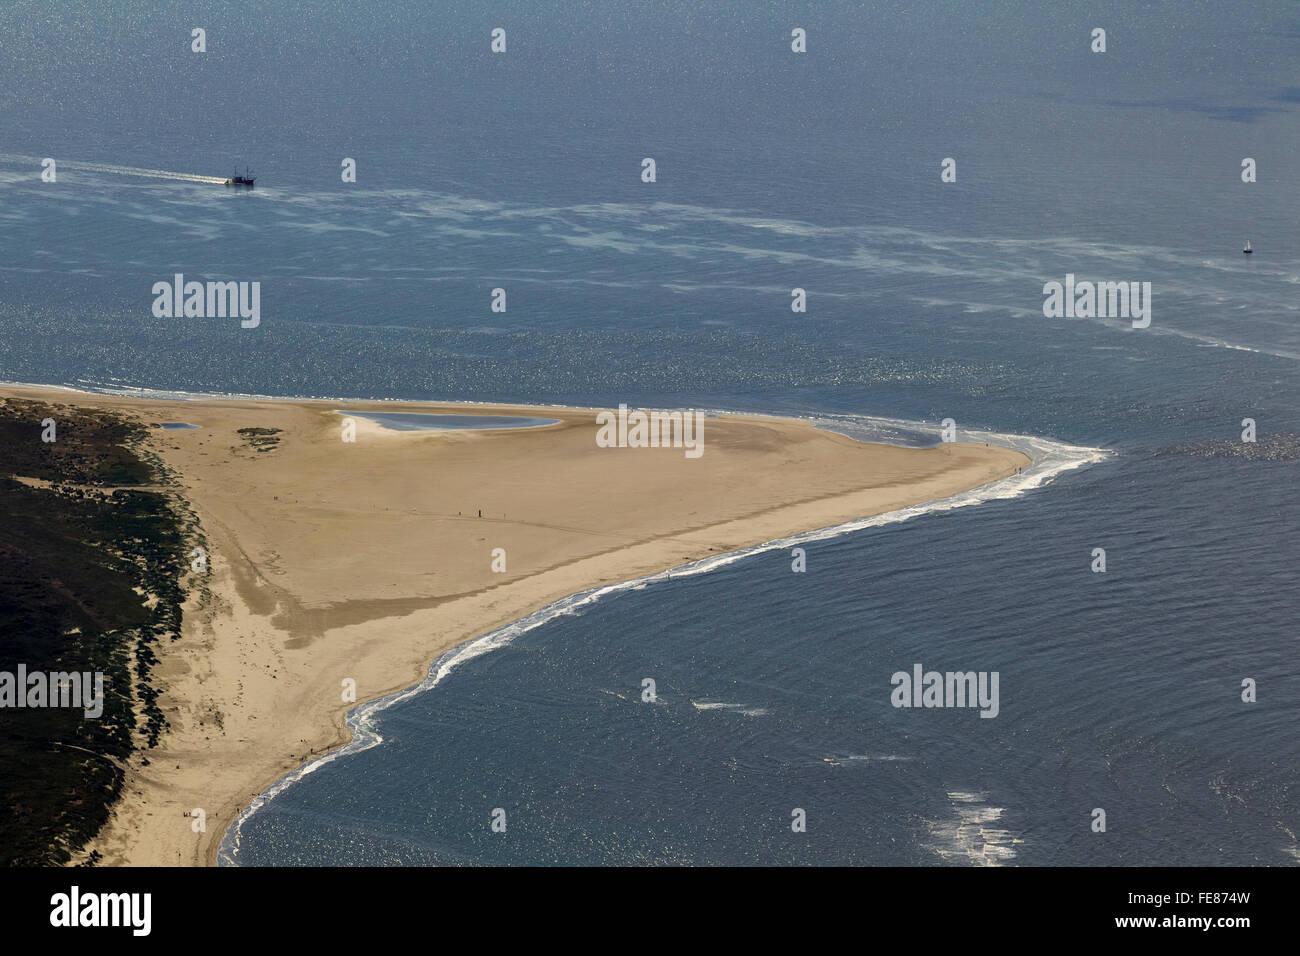 Sandy beach, Osterhook, aerial, Langeoog, North Sea, North Sea island, East Frisian Islands, Lower Saxony, Germany, Stock Photo